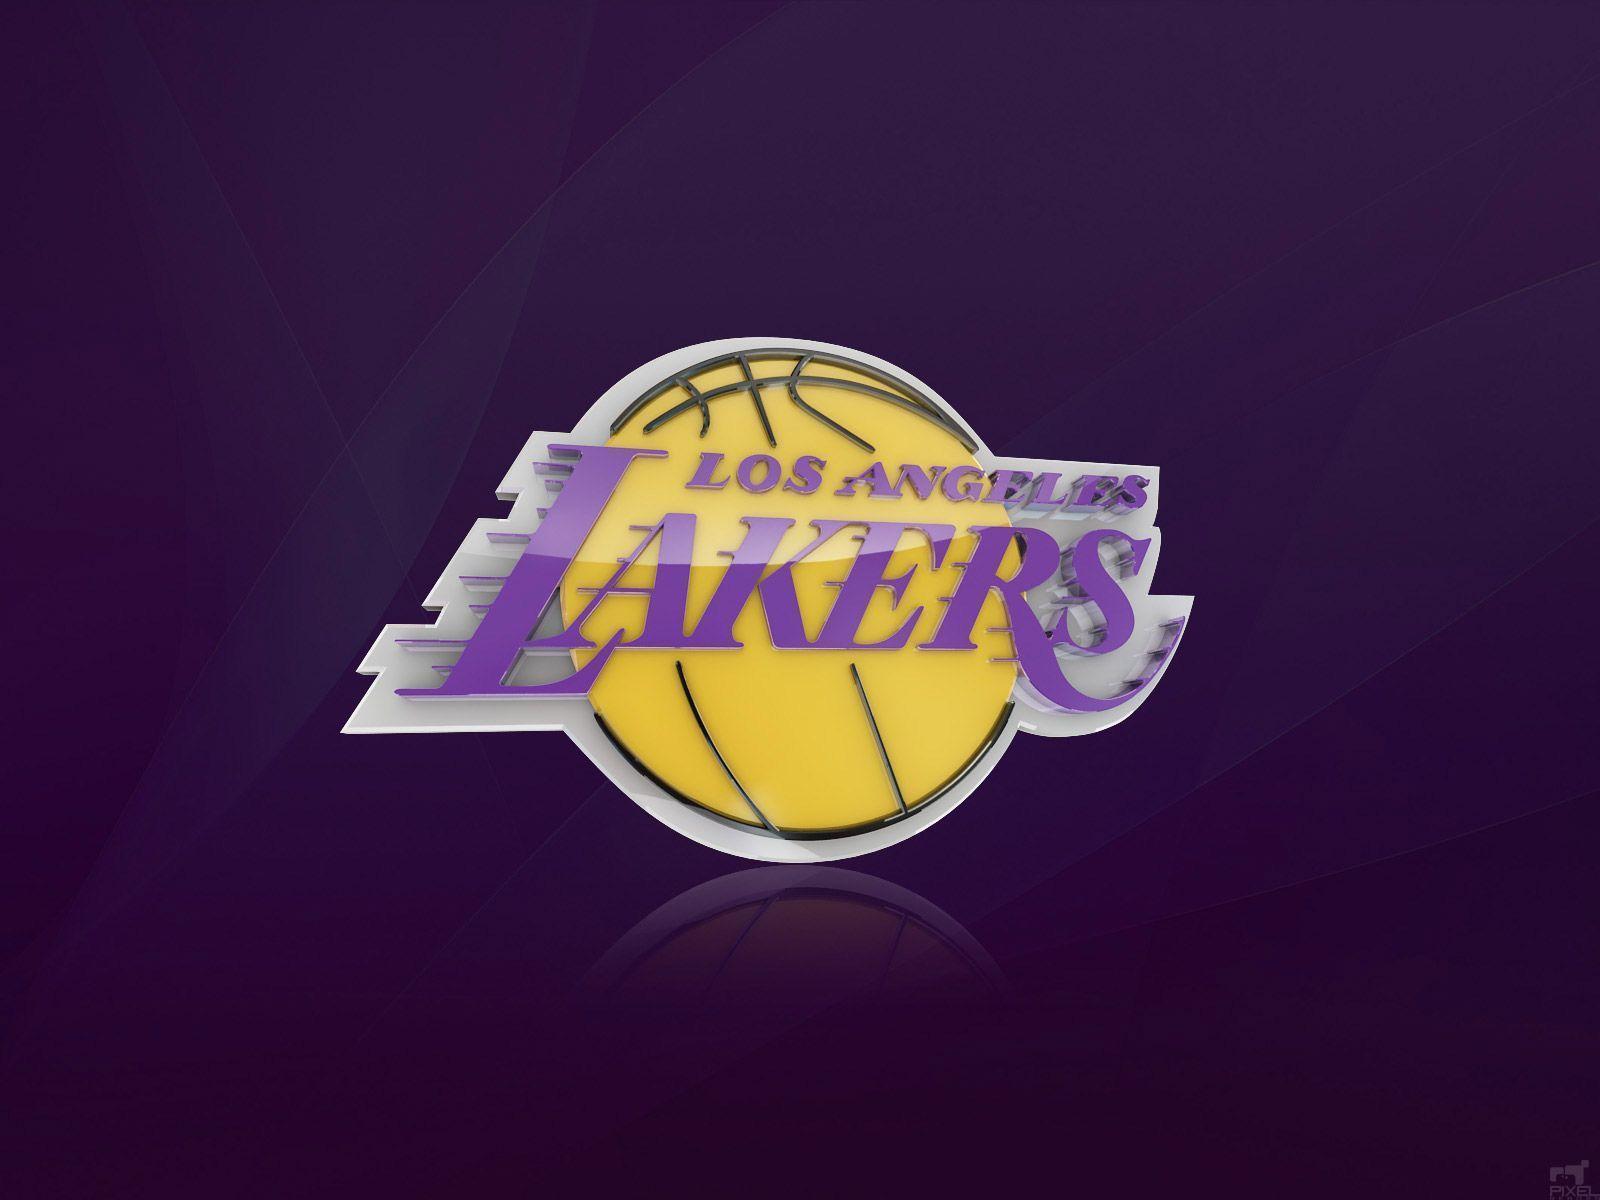 LA Lakers Wallpapers   Top LA Lakers Backgrounds 1600x1200